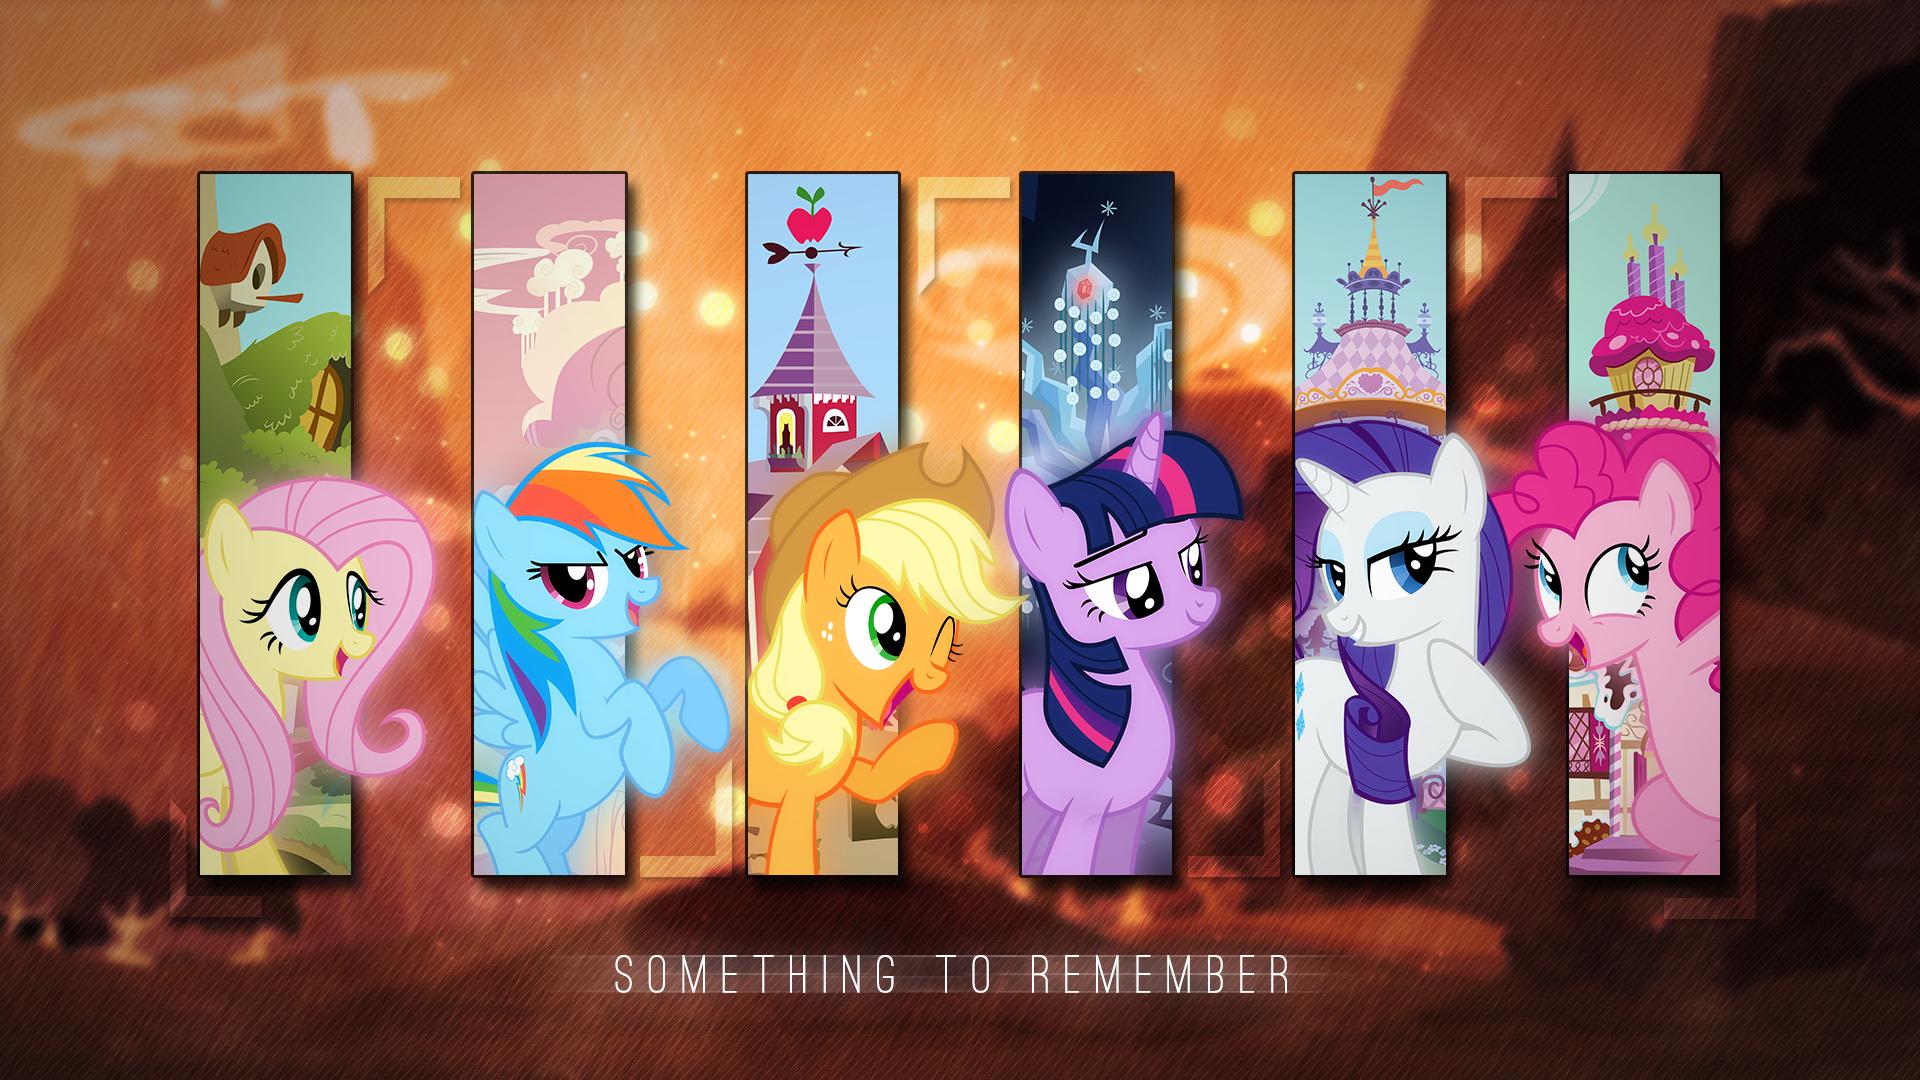 Somethings To Remember